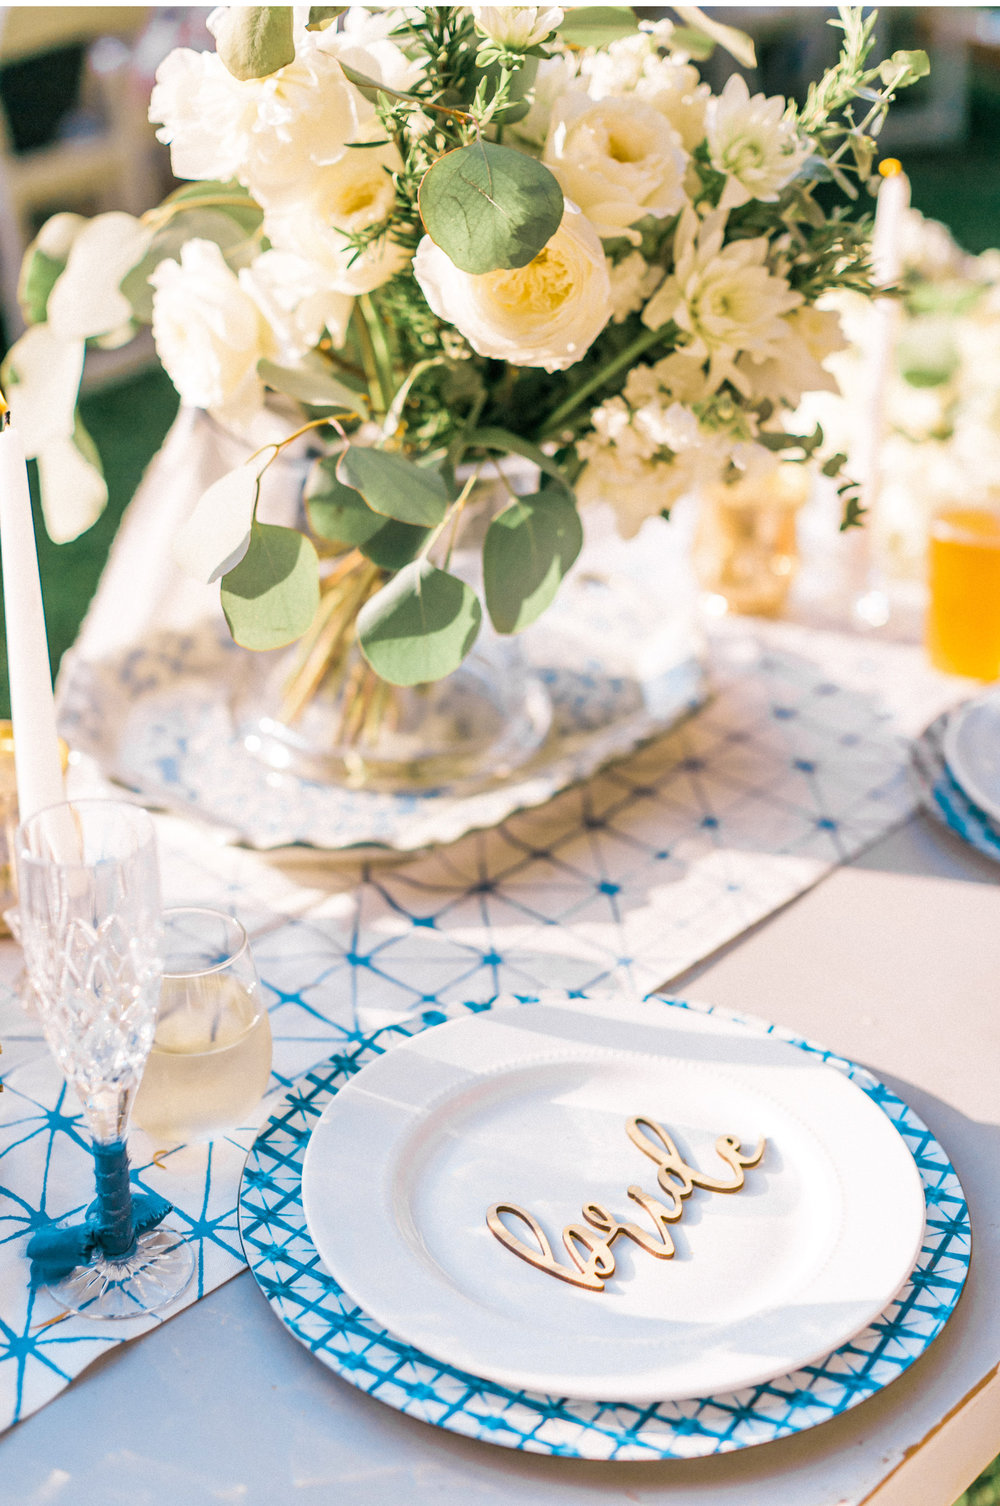 Malibu-Wedding-Photographer-Natalie-Schutt-Photography-Fine-Art-Film-Photography_09.jpg